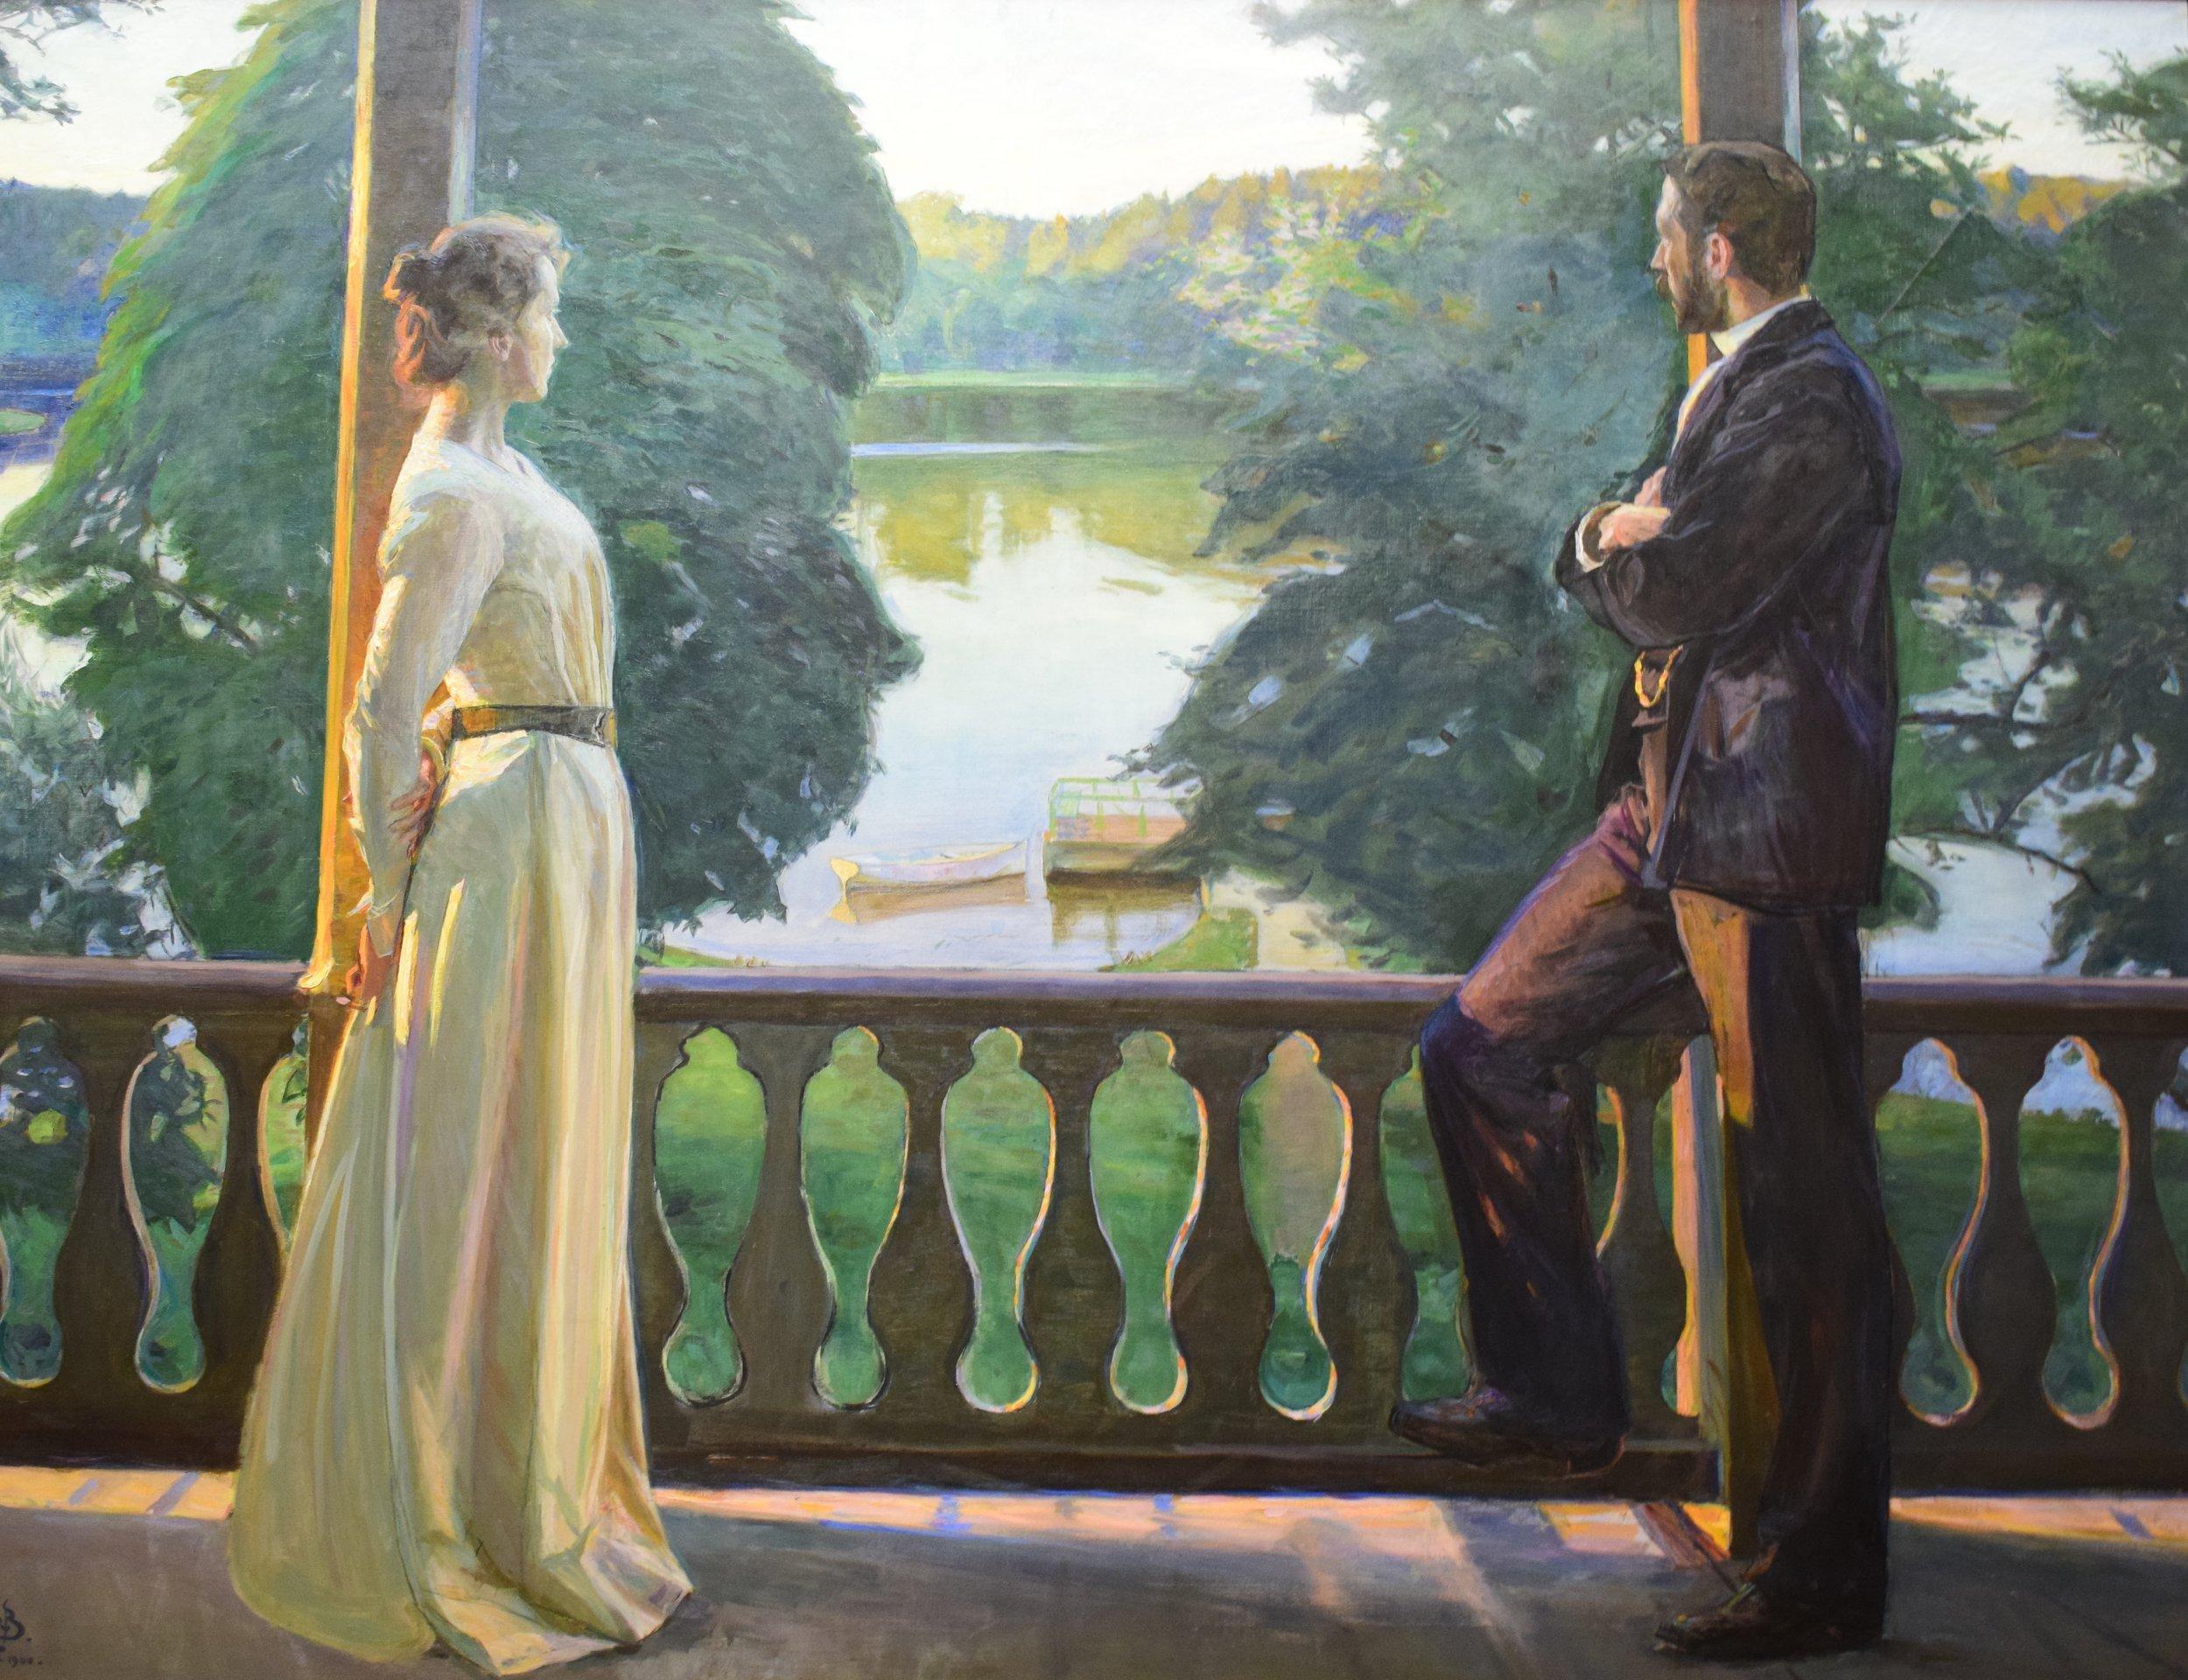 Richard Bergh, Nordisk sommarkväll (Nordic Summer Evening), 1899-1900